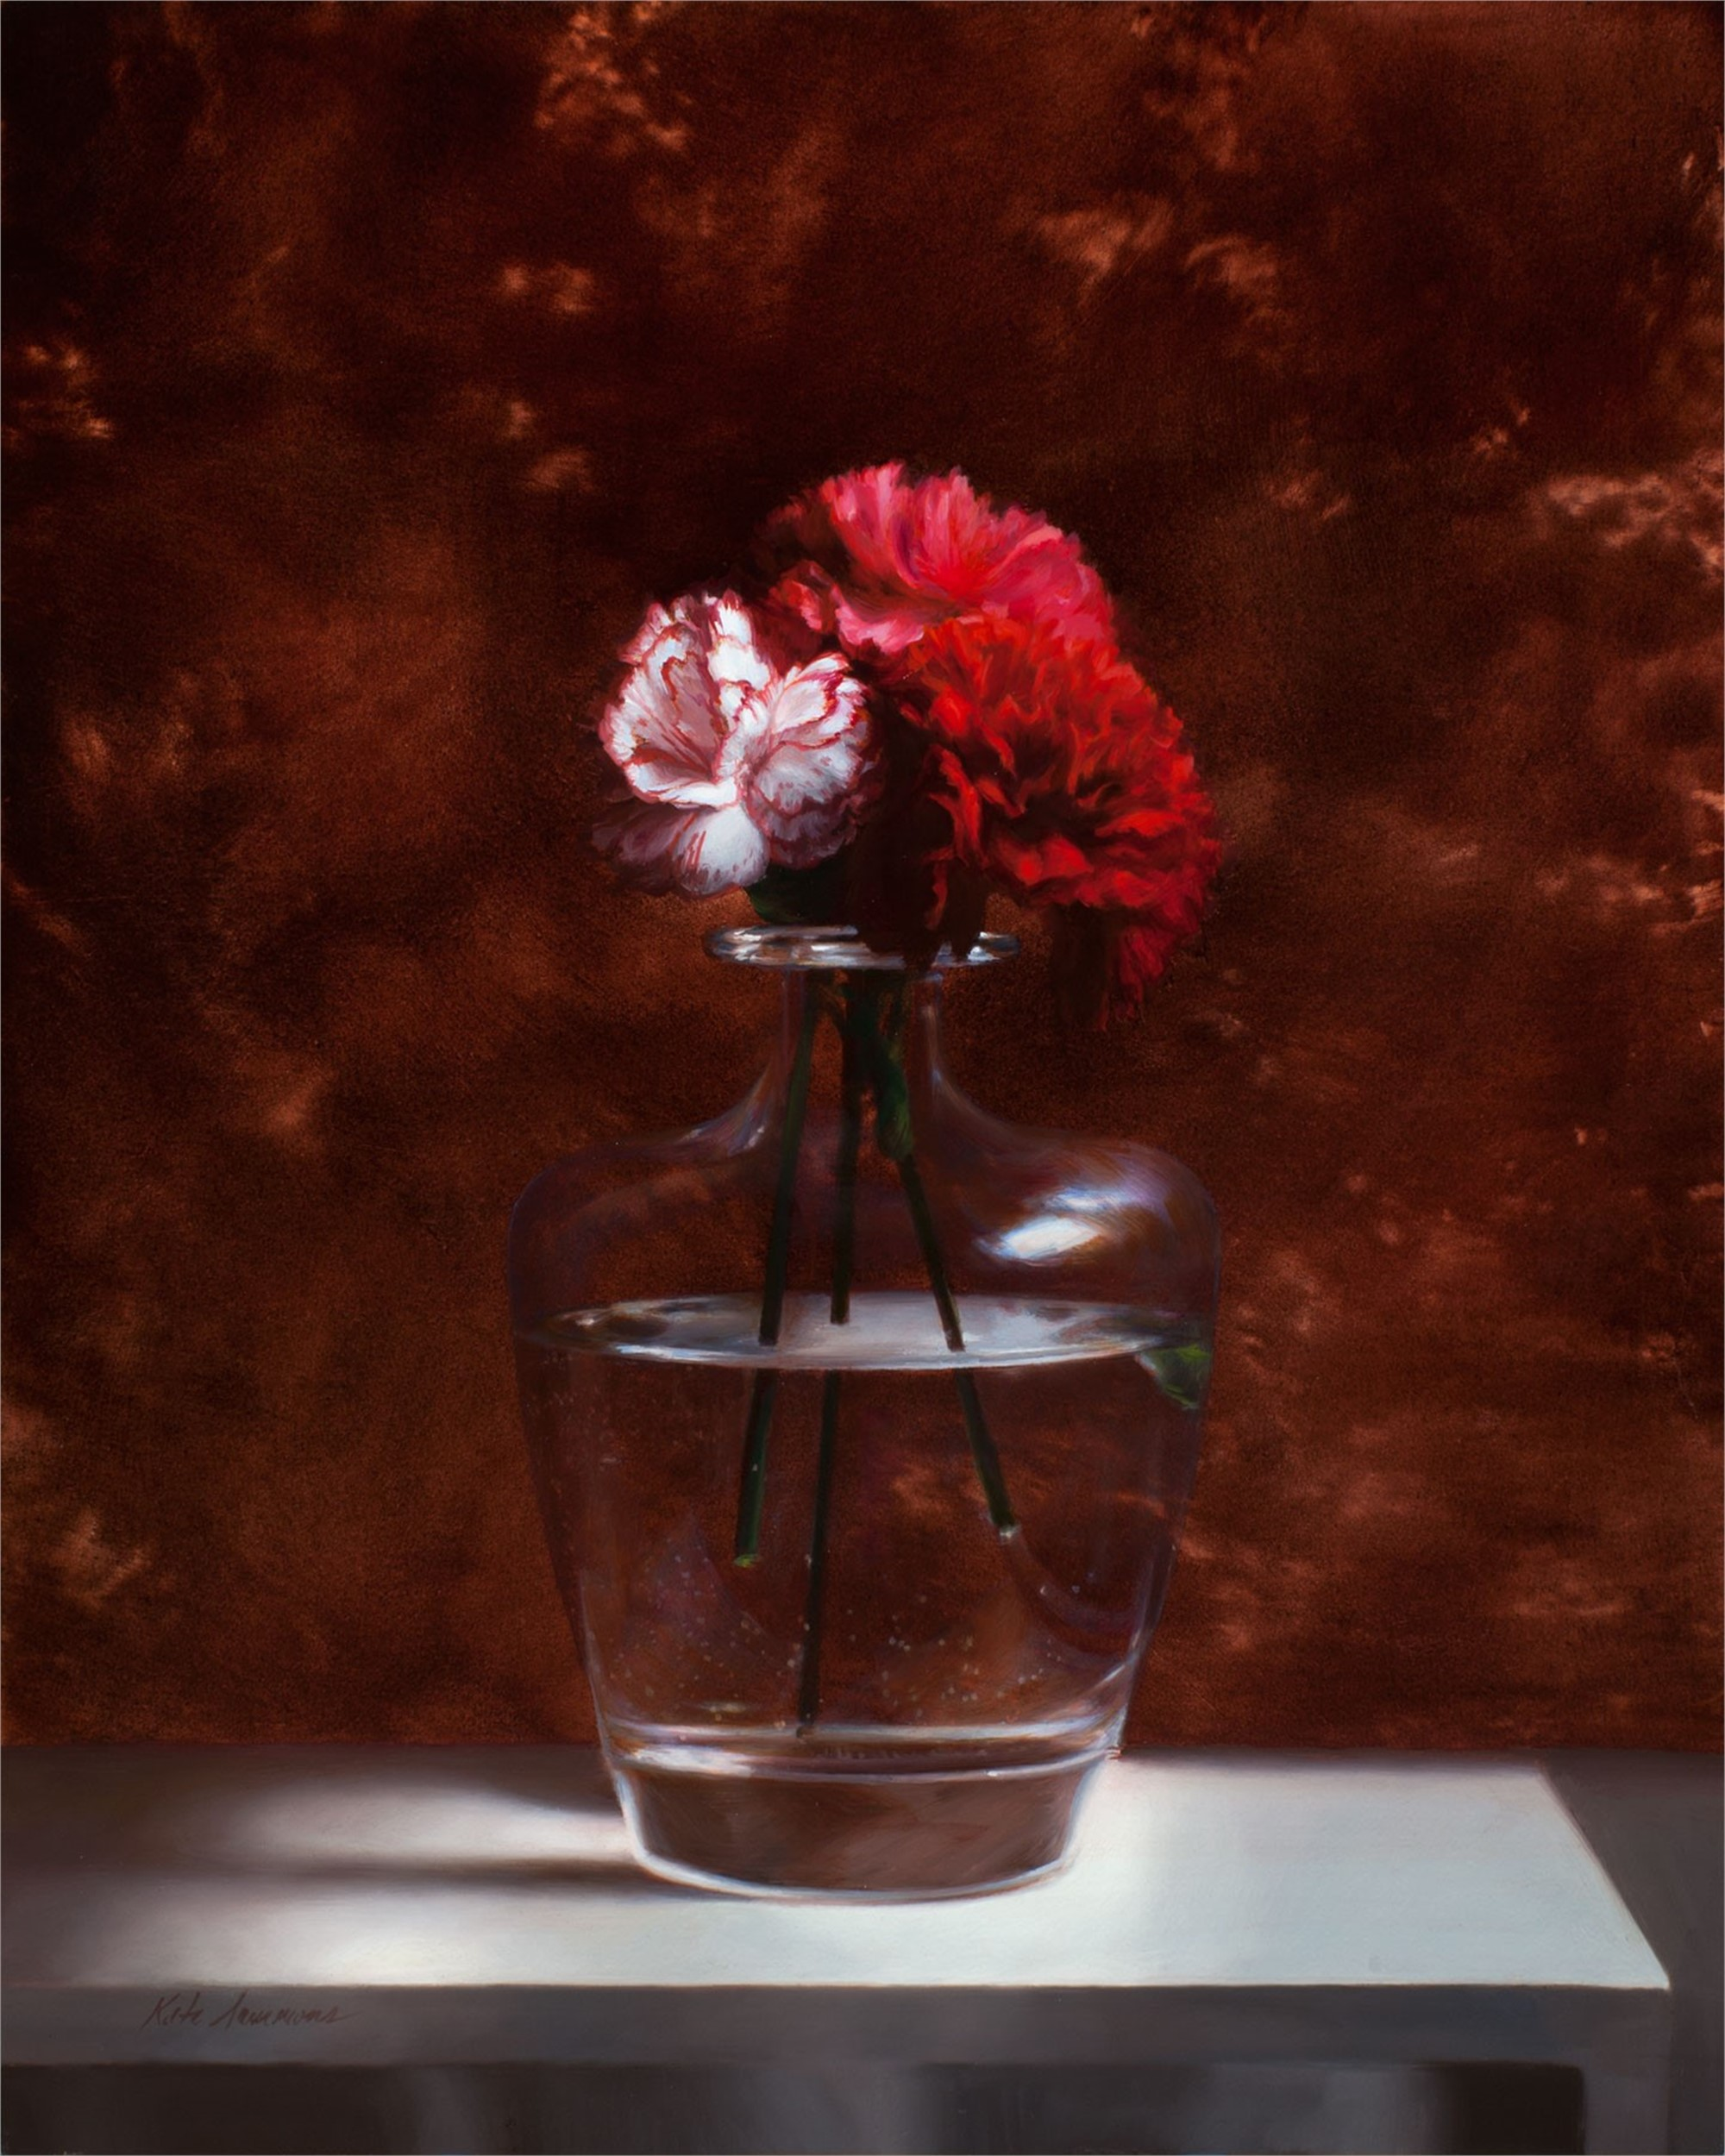 Spanish Carnations by Kate Sammons